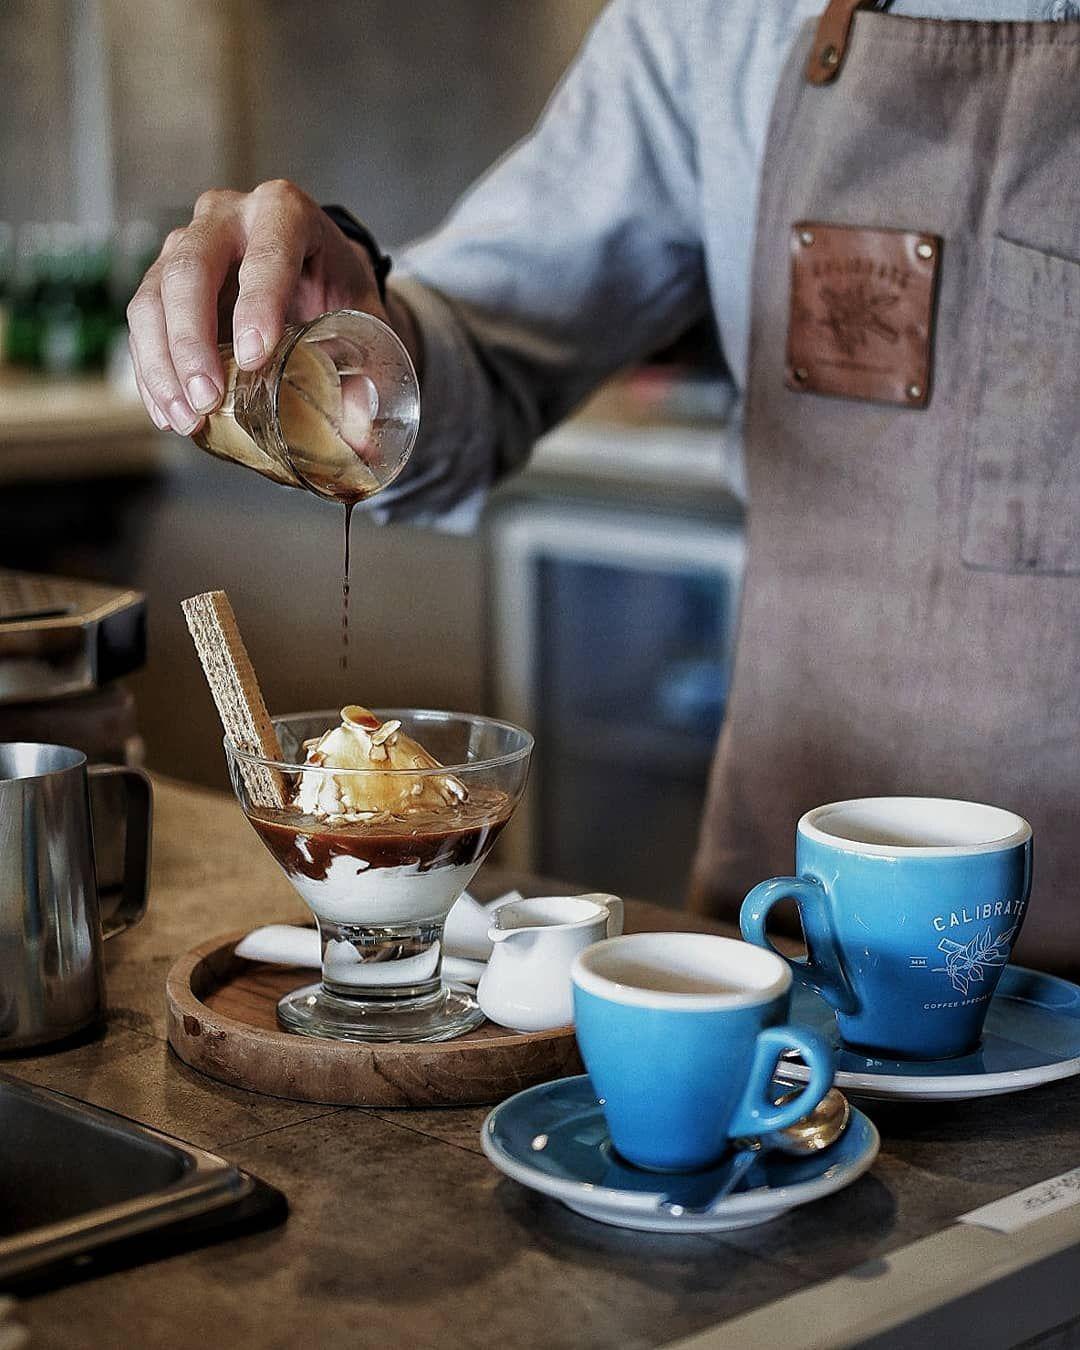 5 Coffee Shop di Jakarta Barat yang Asyik Buat Santai, Kopinya Beragam!